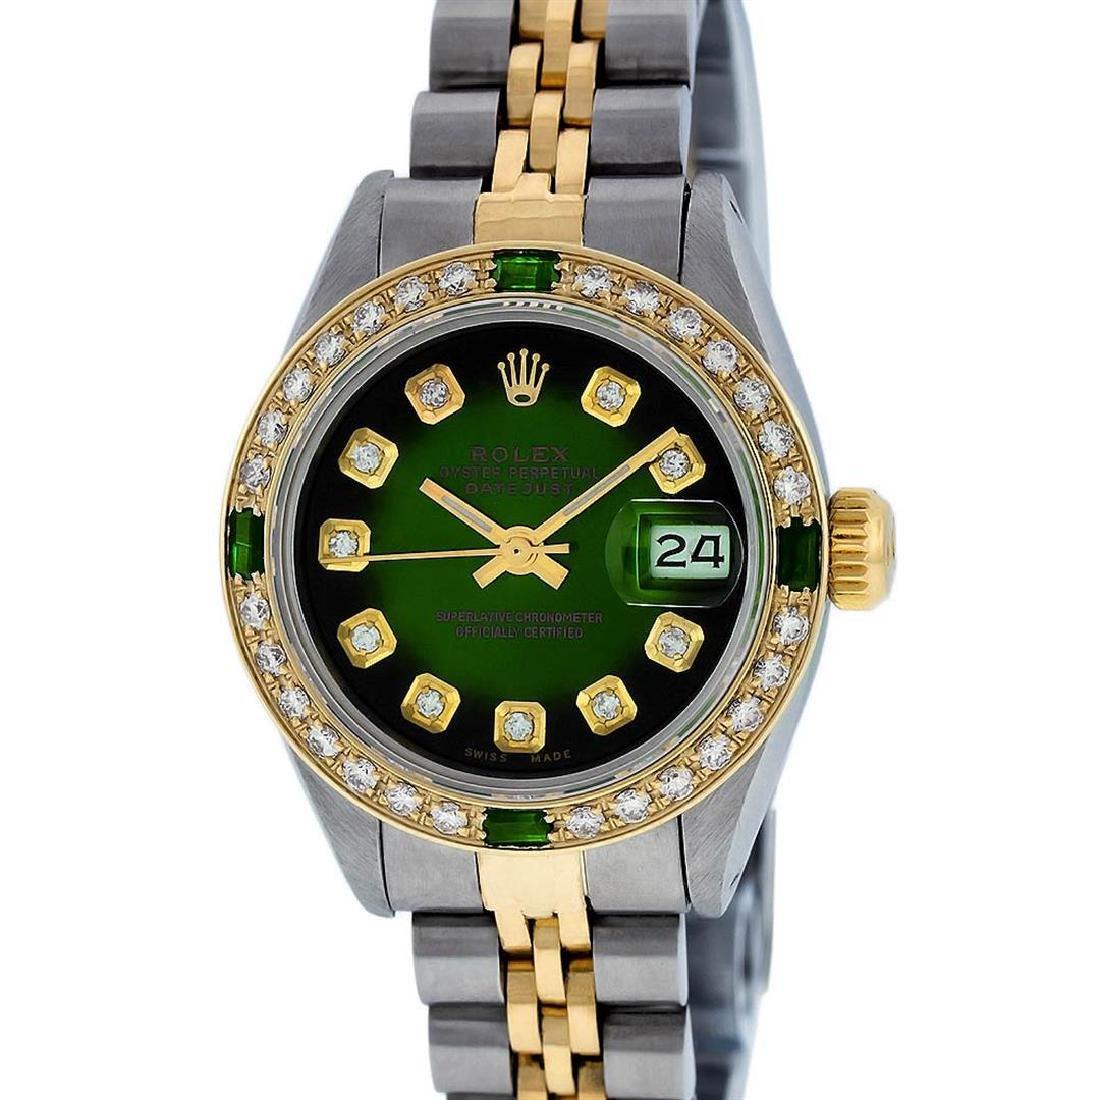 Rolex Ladies 2 Tone Green Vignette Diamond Datejust - 8